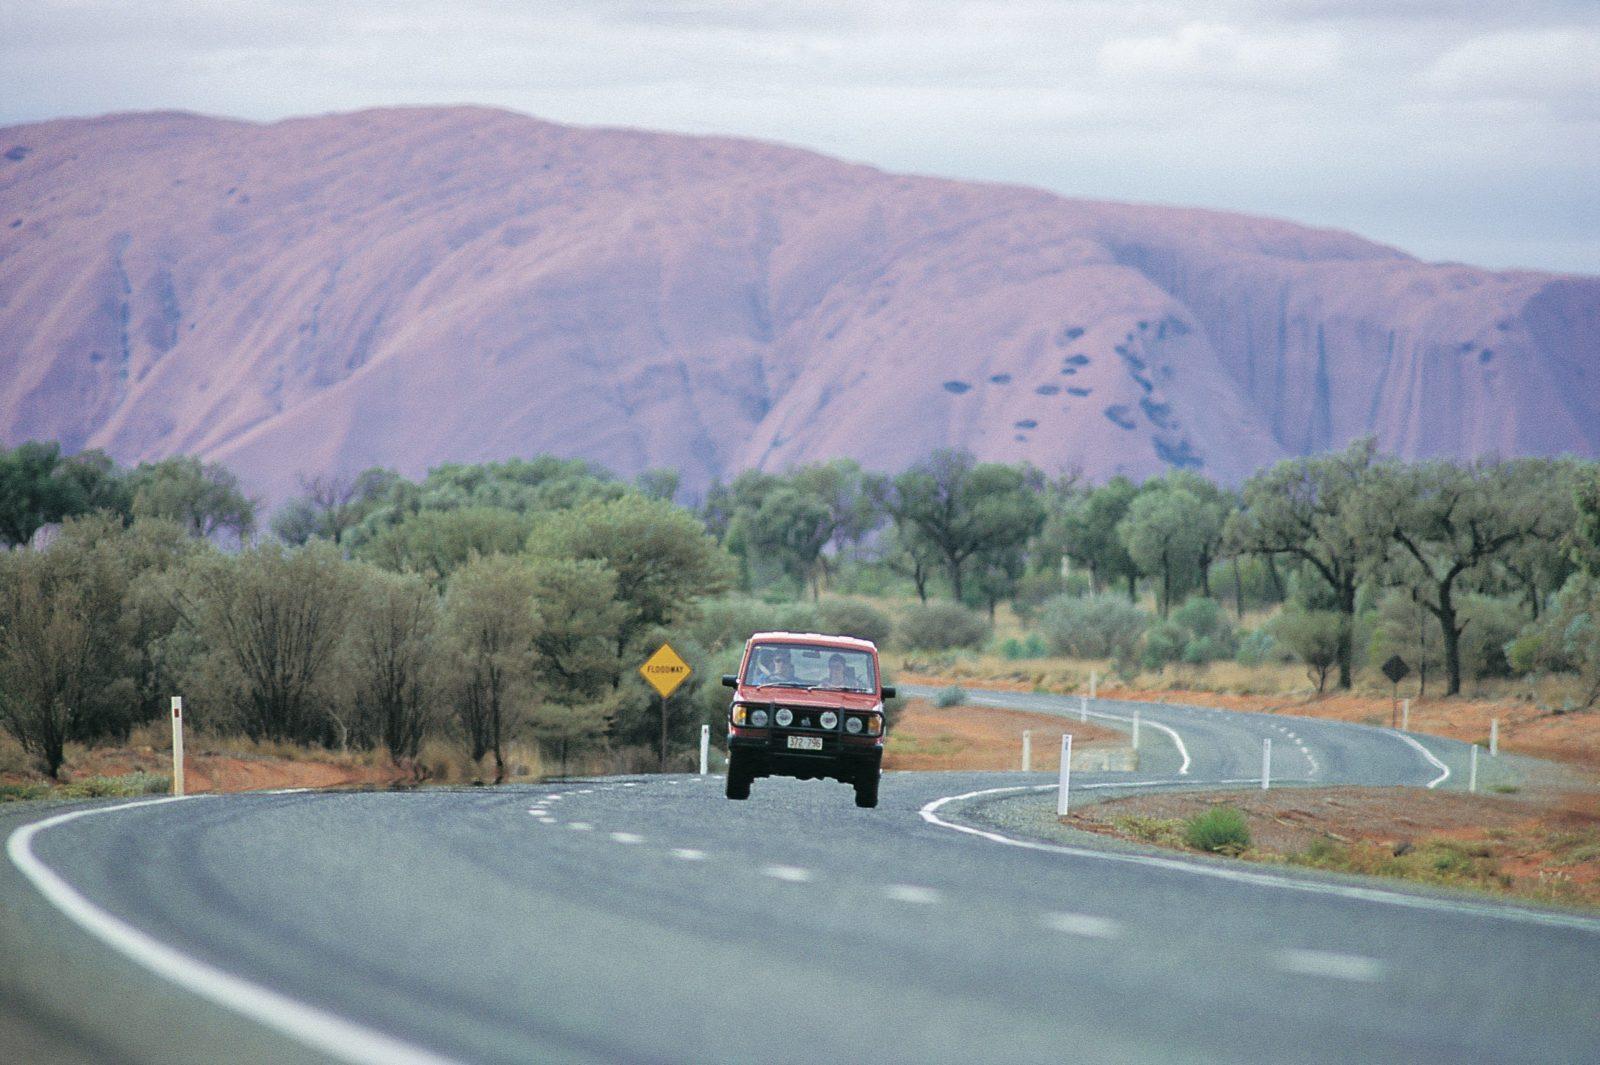 Uluru Kata Tjuta National Park, Ayers Rock, Northern Territory, Central Australia